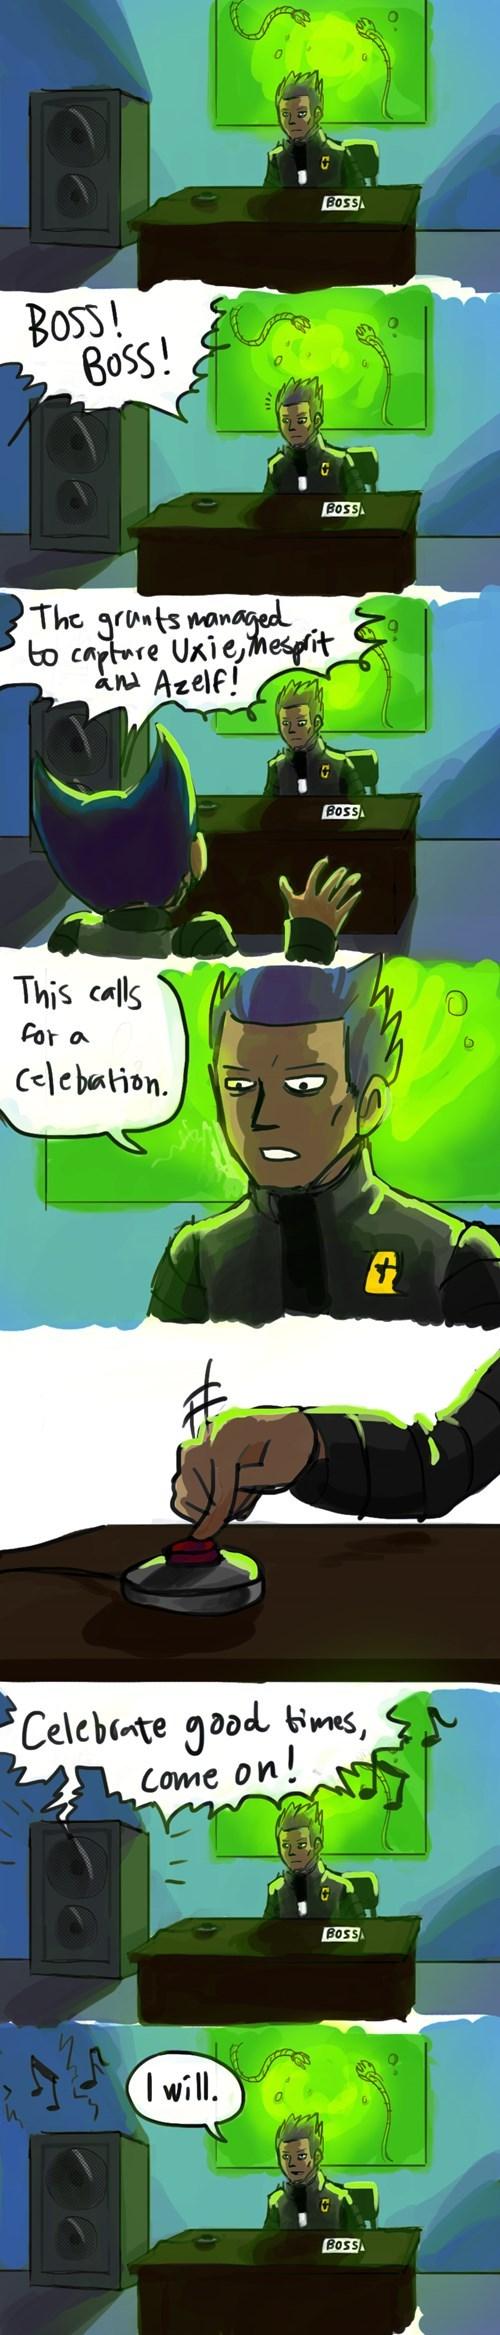 pokemon memes team galactic celebrate